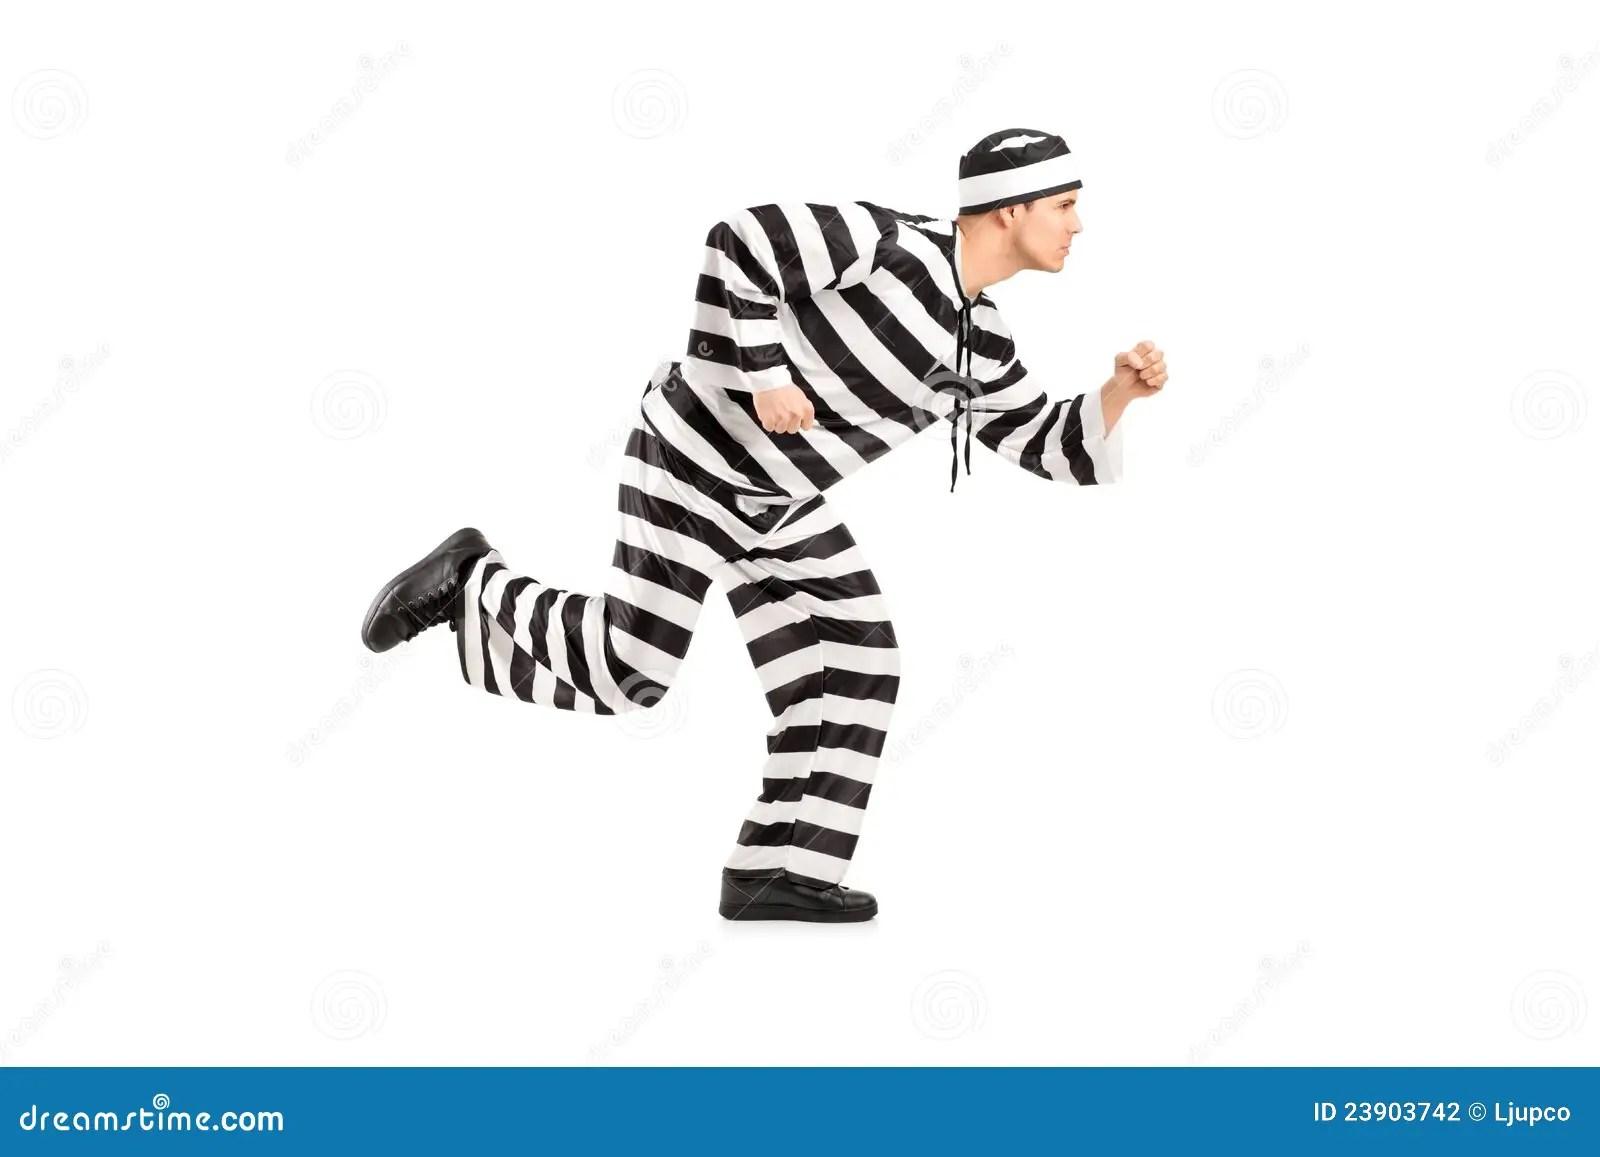 Full Length Portrait Of A Prisoner Escaping Stock Photo